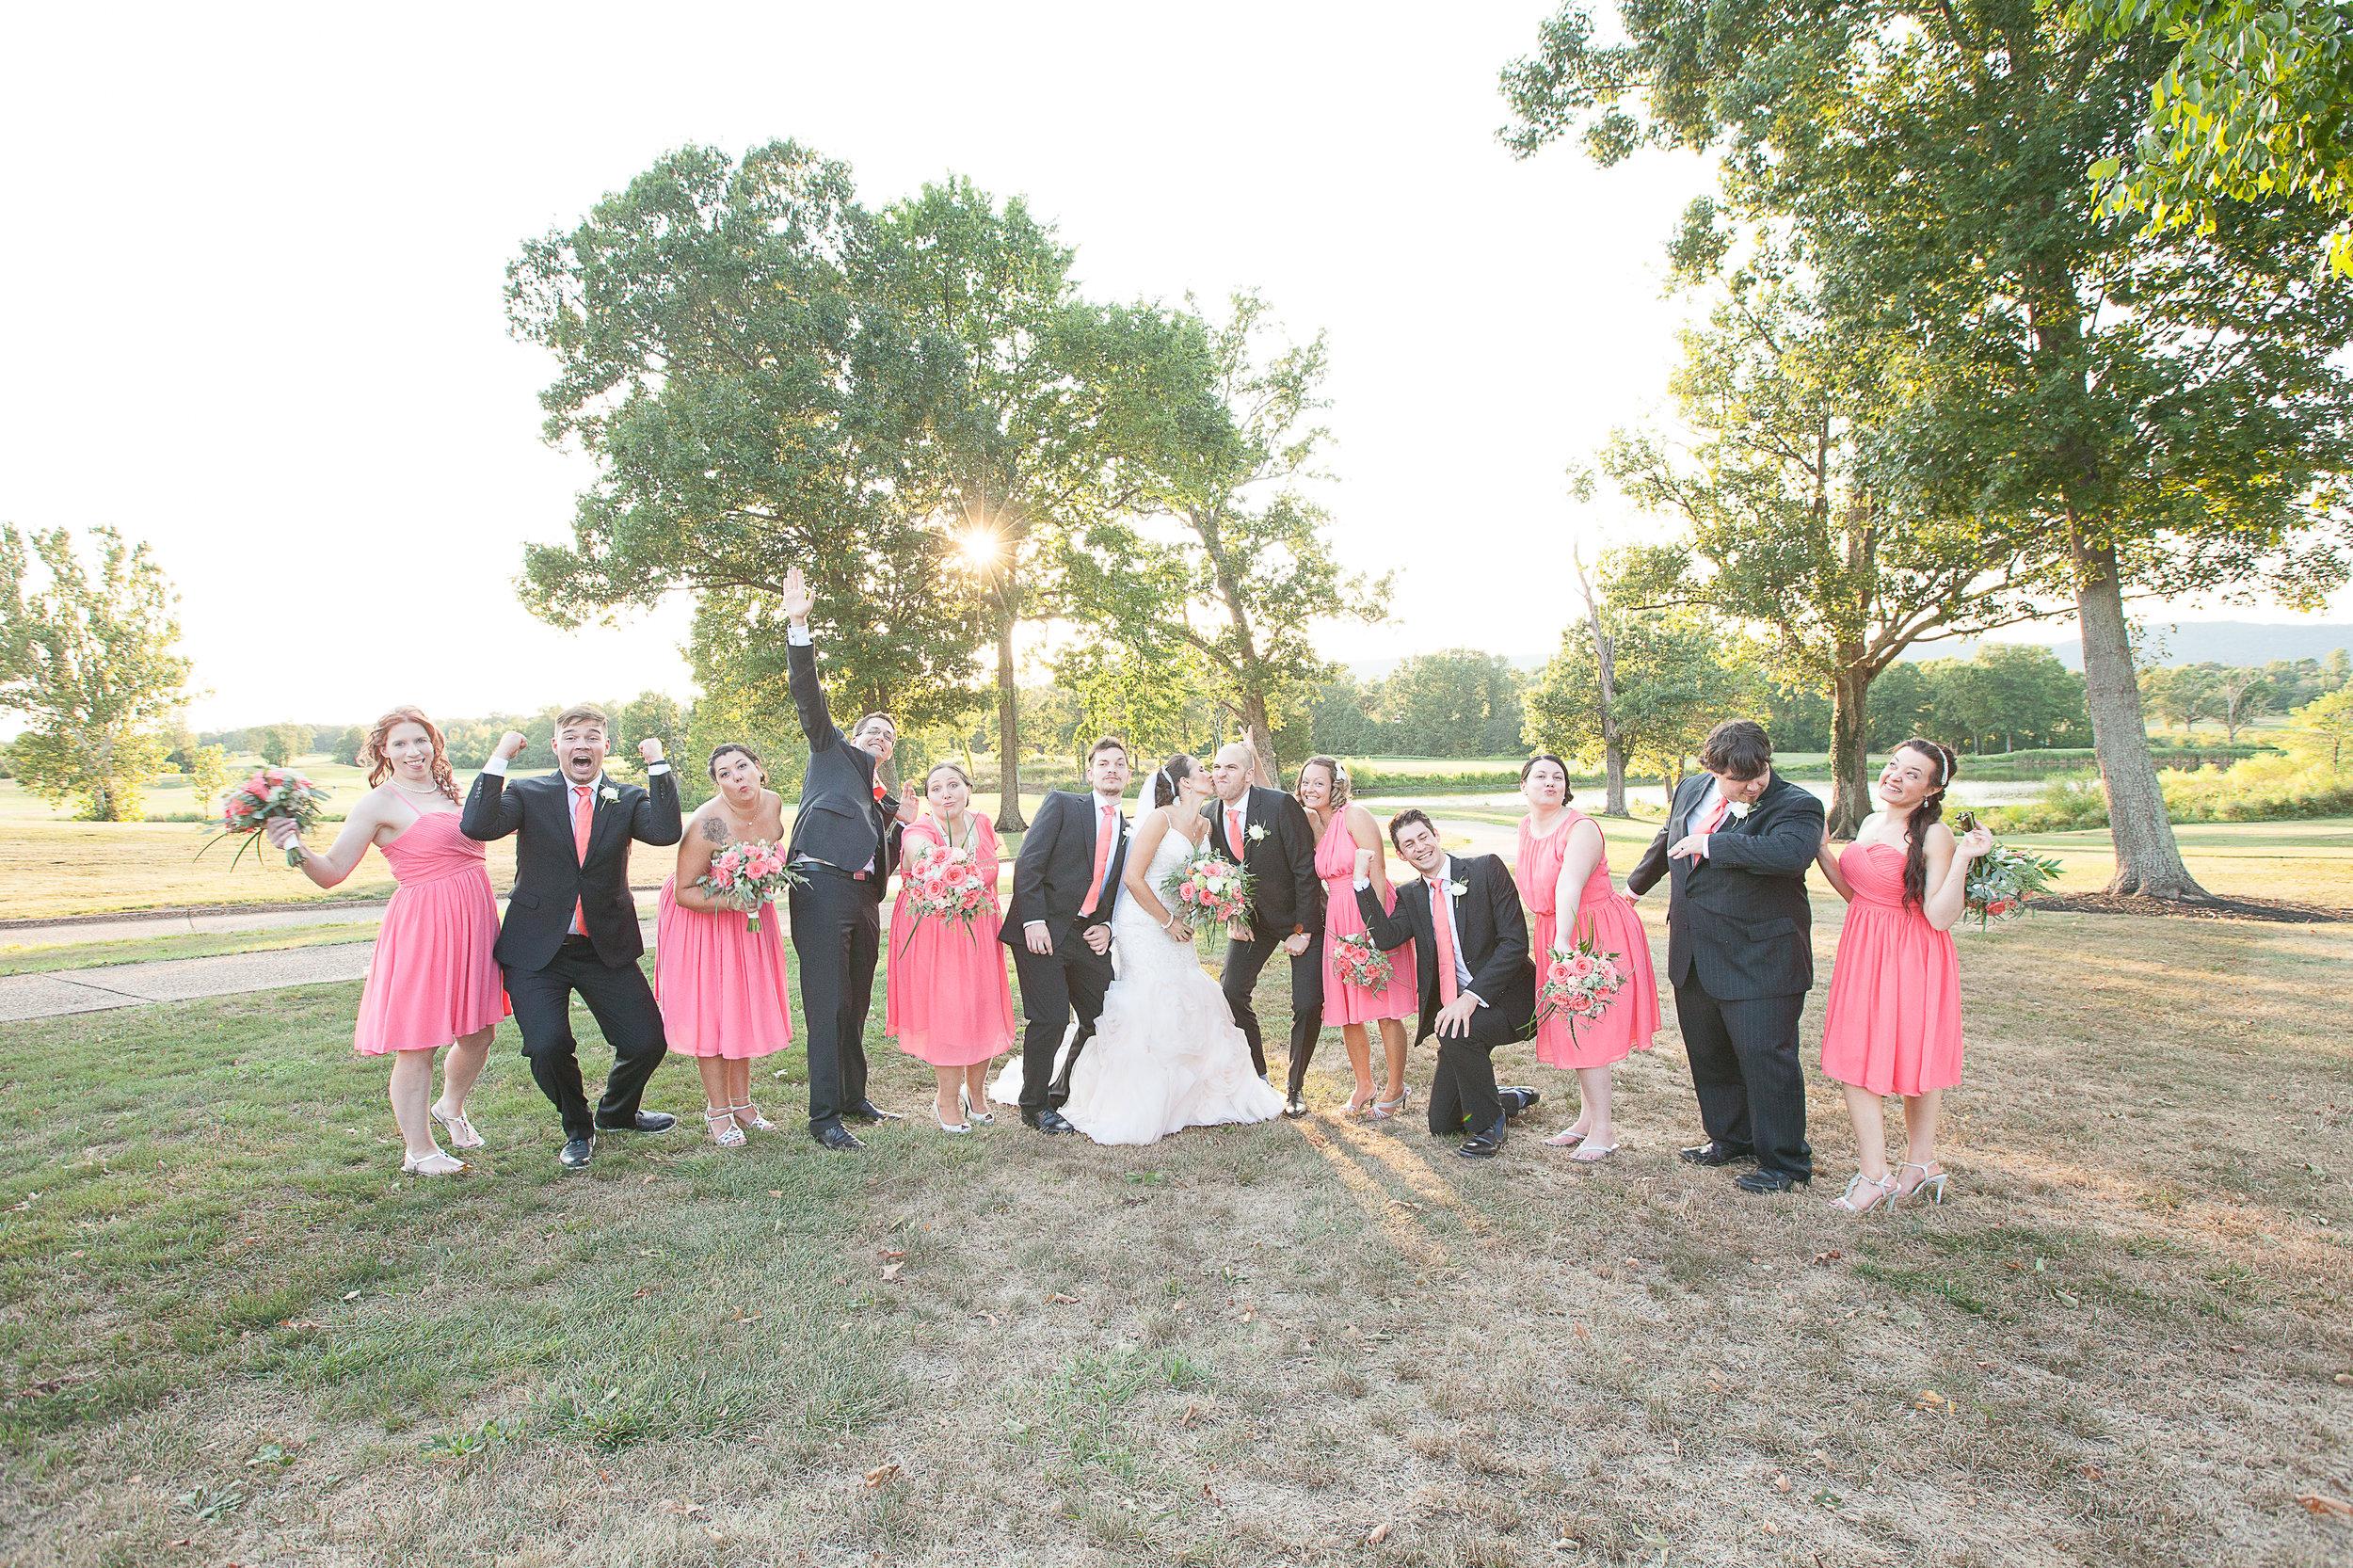 Marissa-Timon-Wedding-Kim-Pham-Clark-Photography-09.jpg